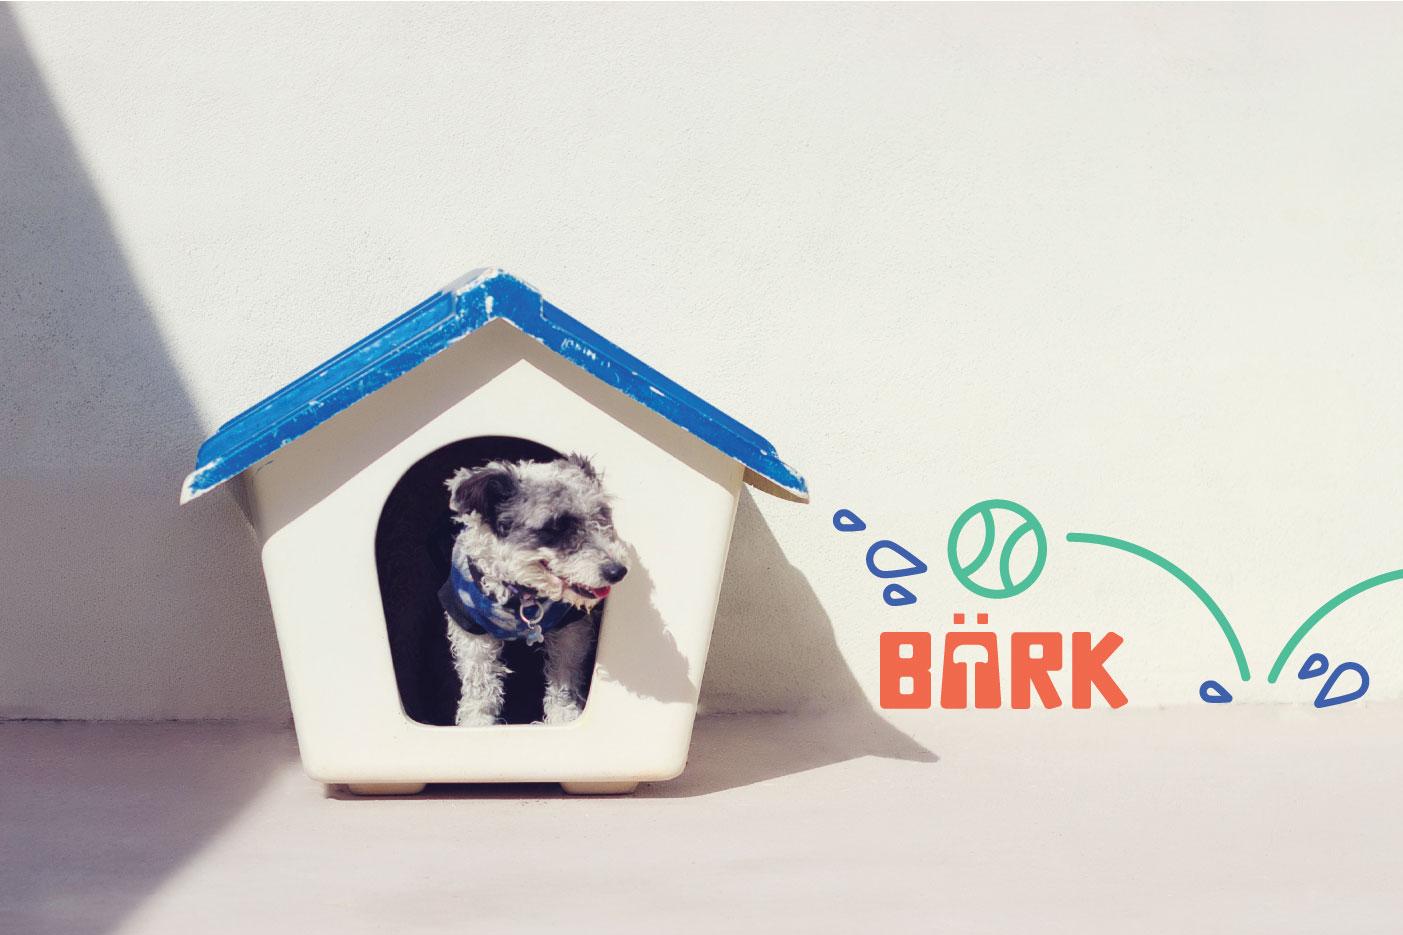 bark-wall-art.jpg